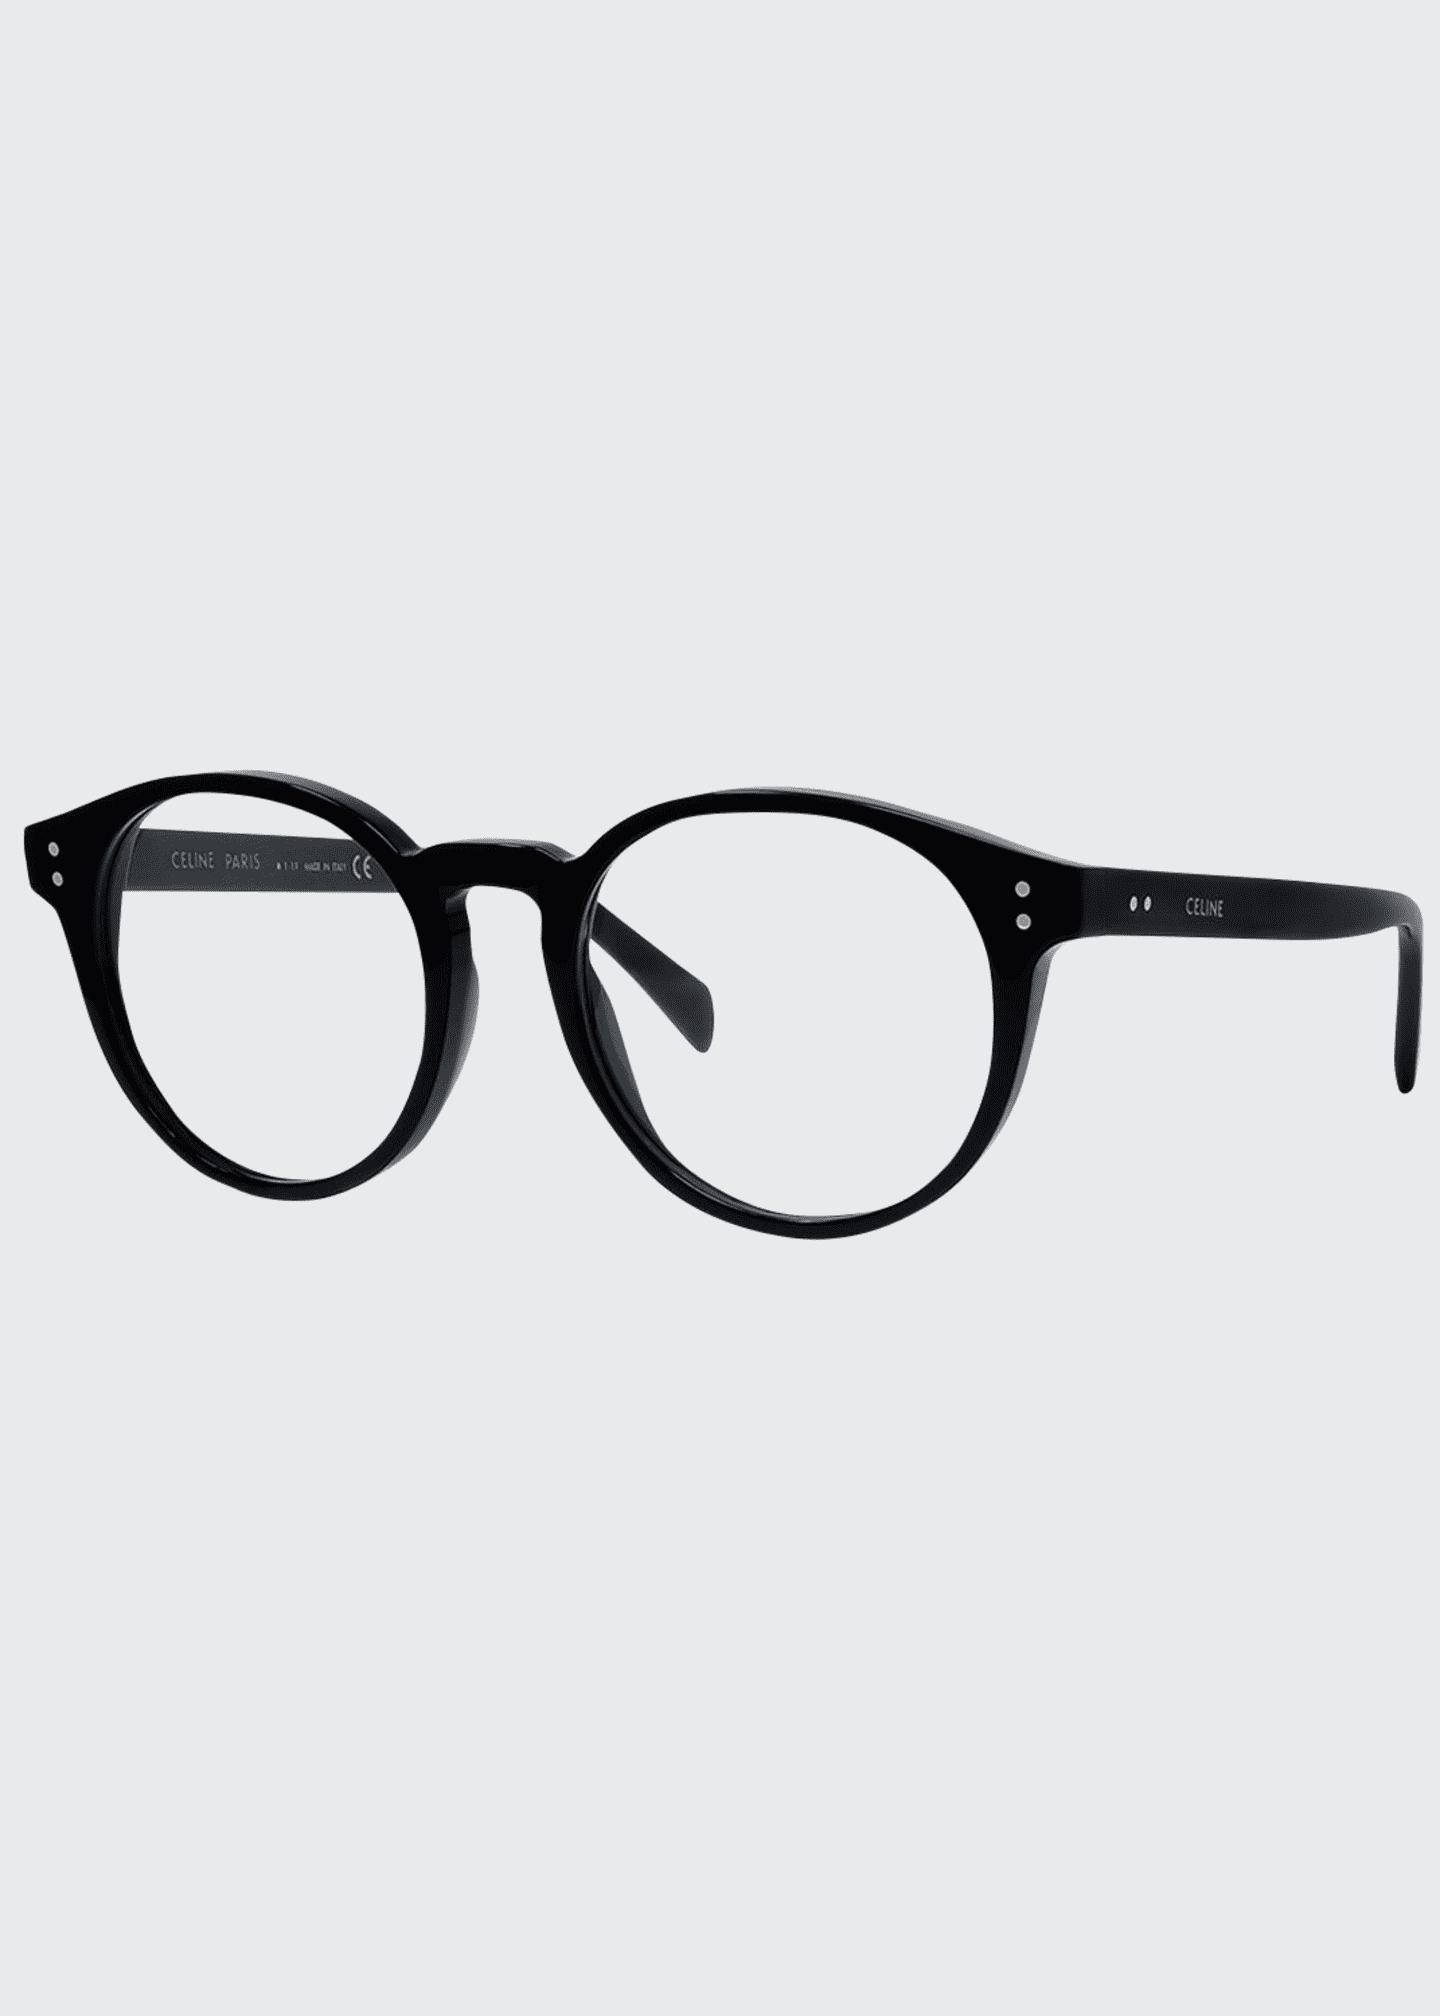 Celine Round Acetate Optical Frames